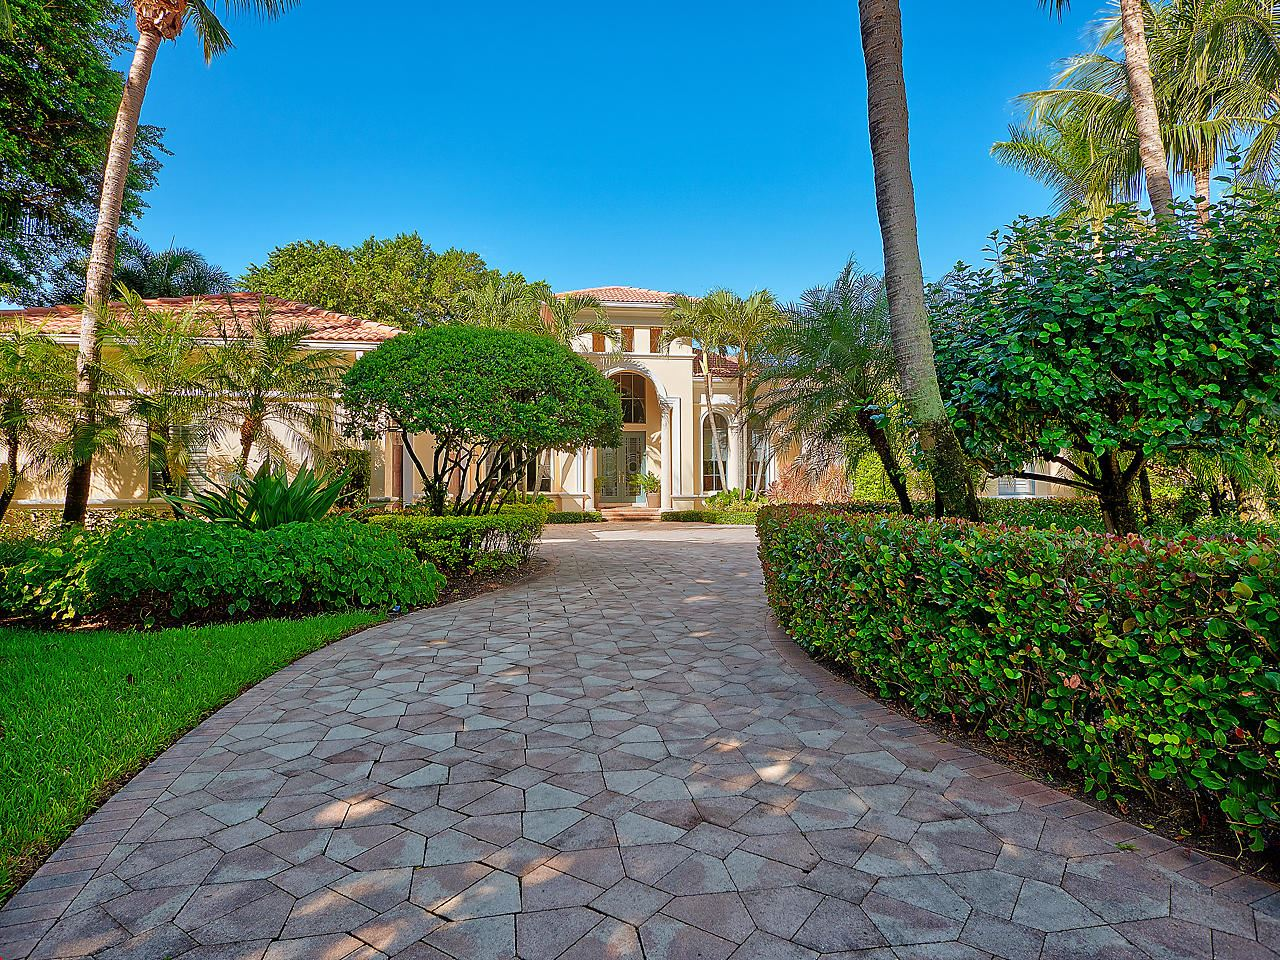 Photo of 101 Grand Palm Way, Palm Beach Gardens, FL 33418 (MLS # RX-10648143)